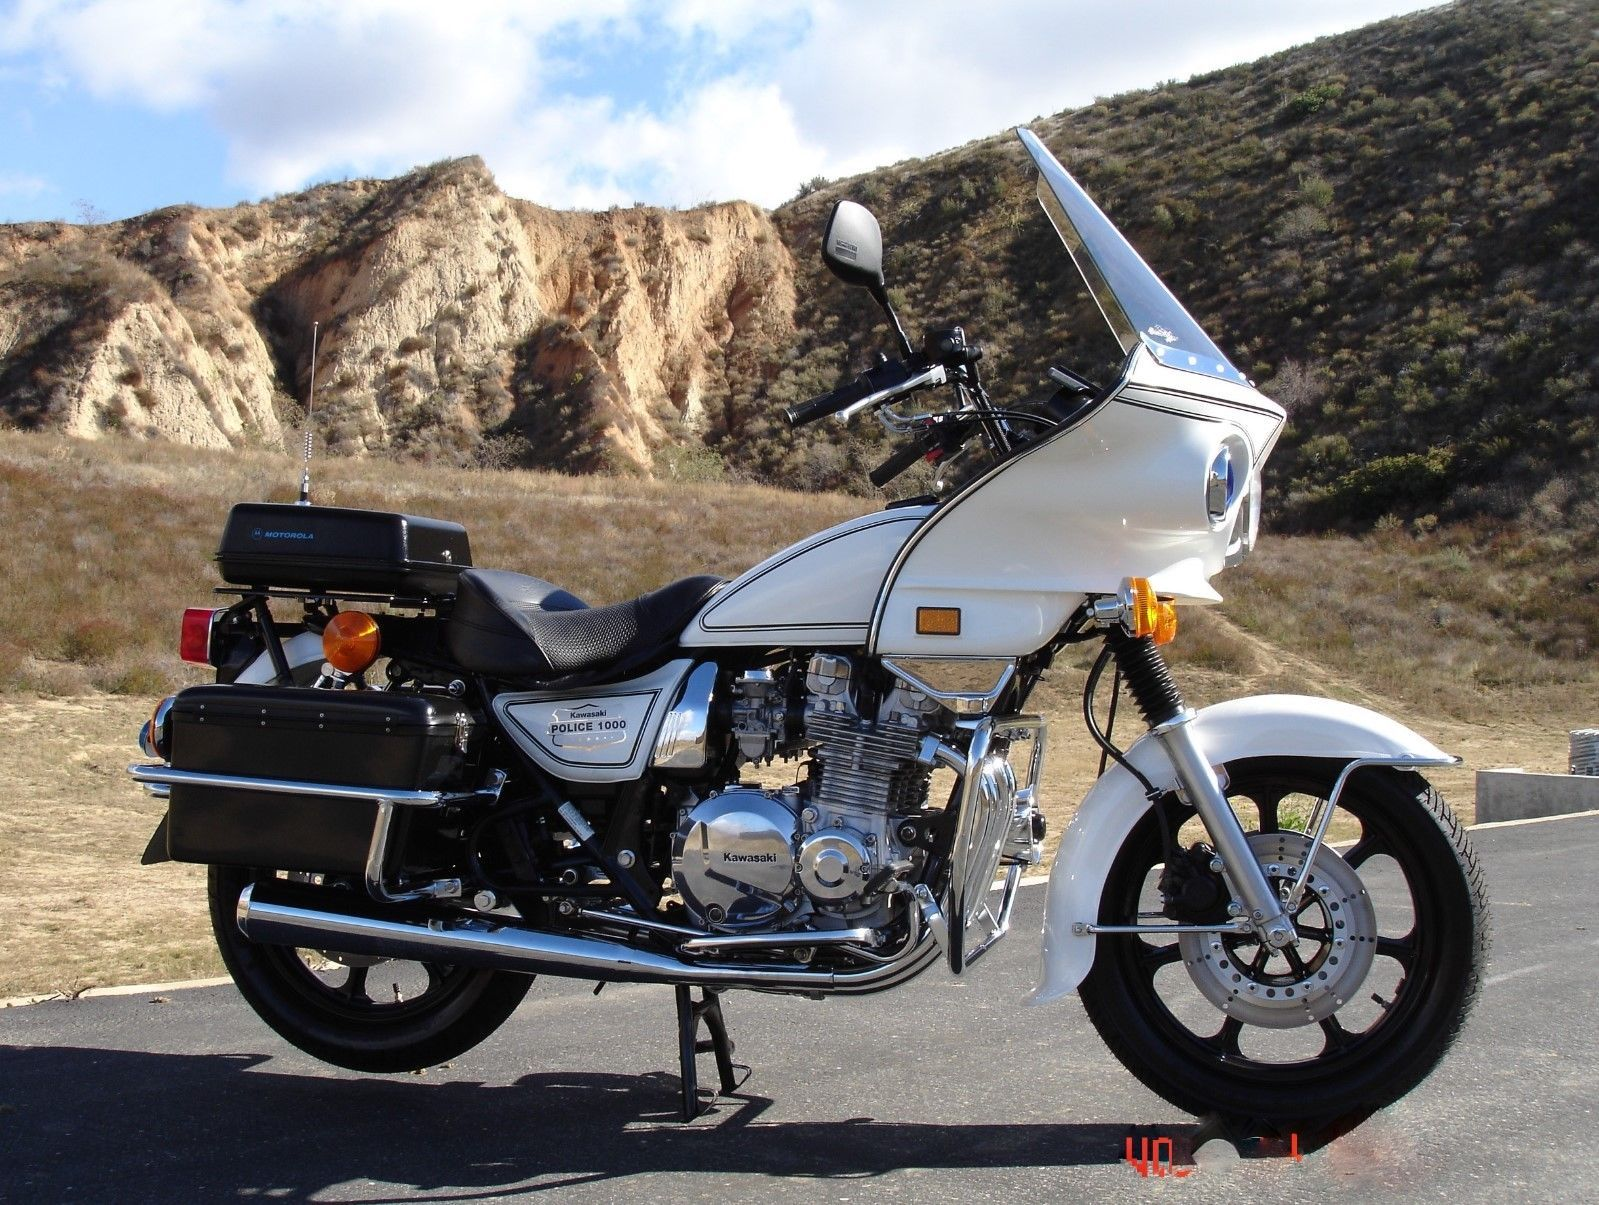 hight resolution of 2000 kawasaki kz 1000 kz1000p police show bike spare bike nos ebay link